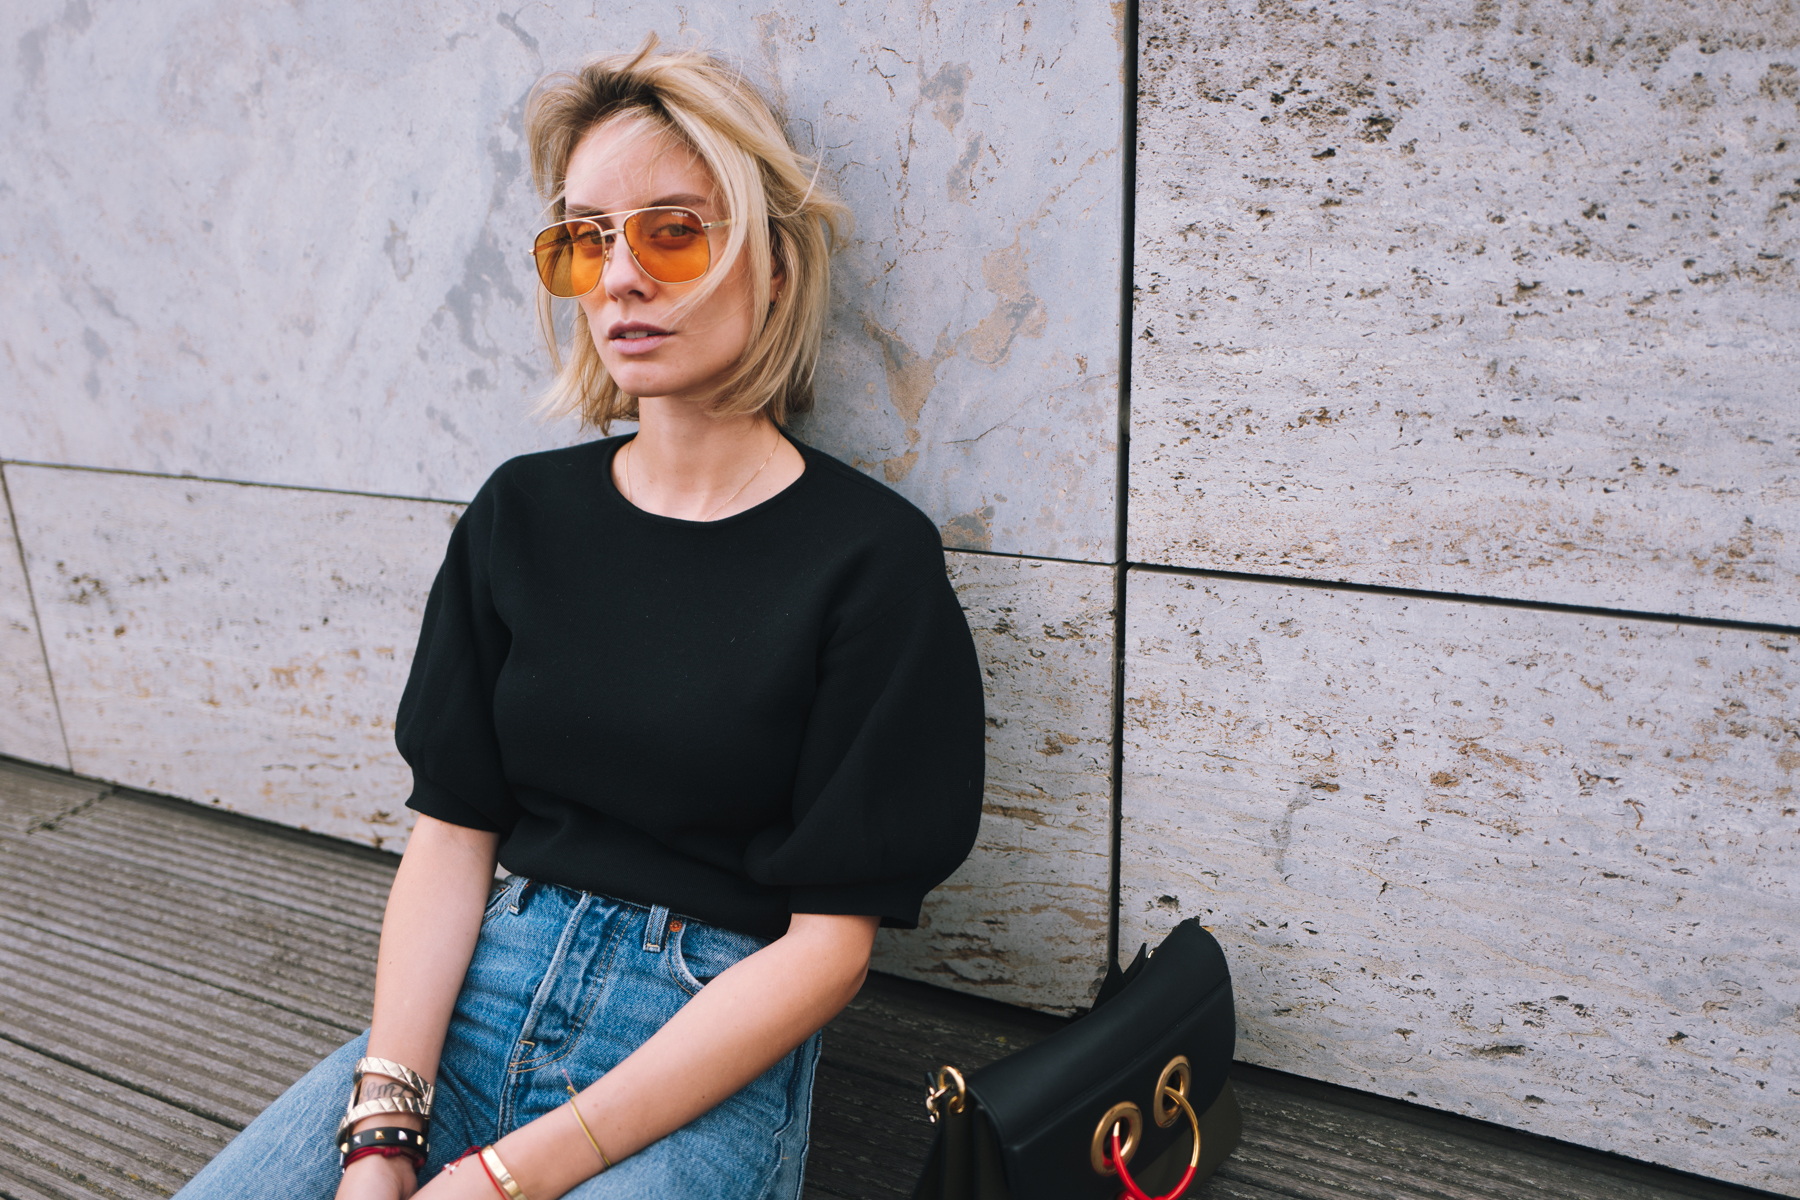 Balenciaga x Colette Outfit Fashion Blogger Düsseldorf Lisa Hahnbück